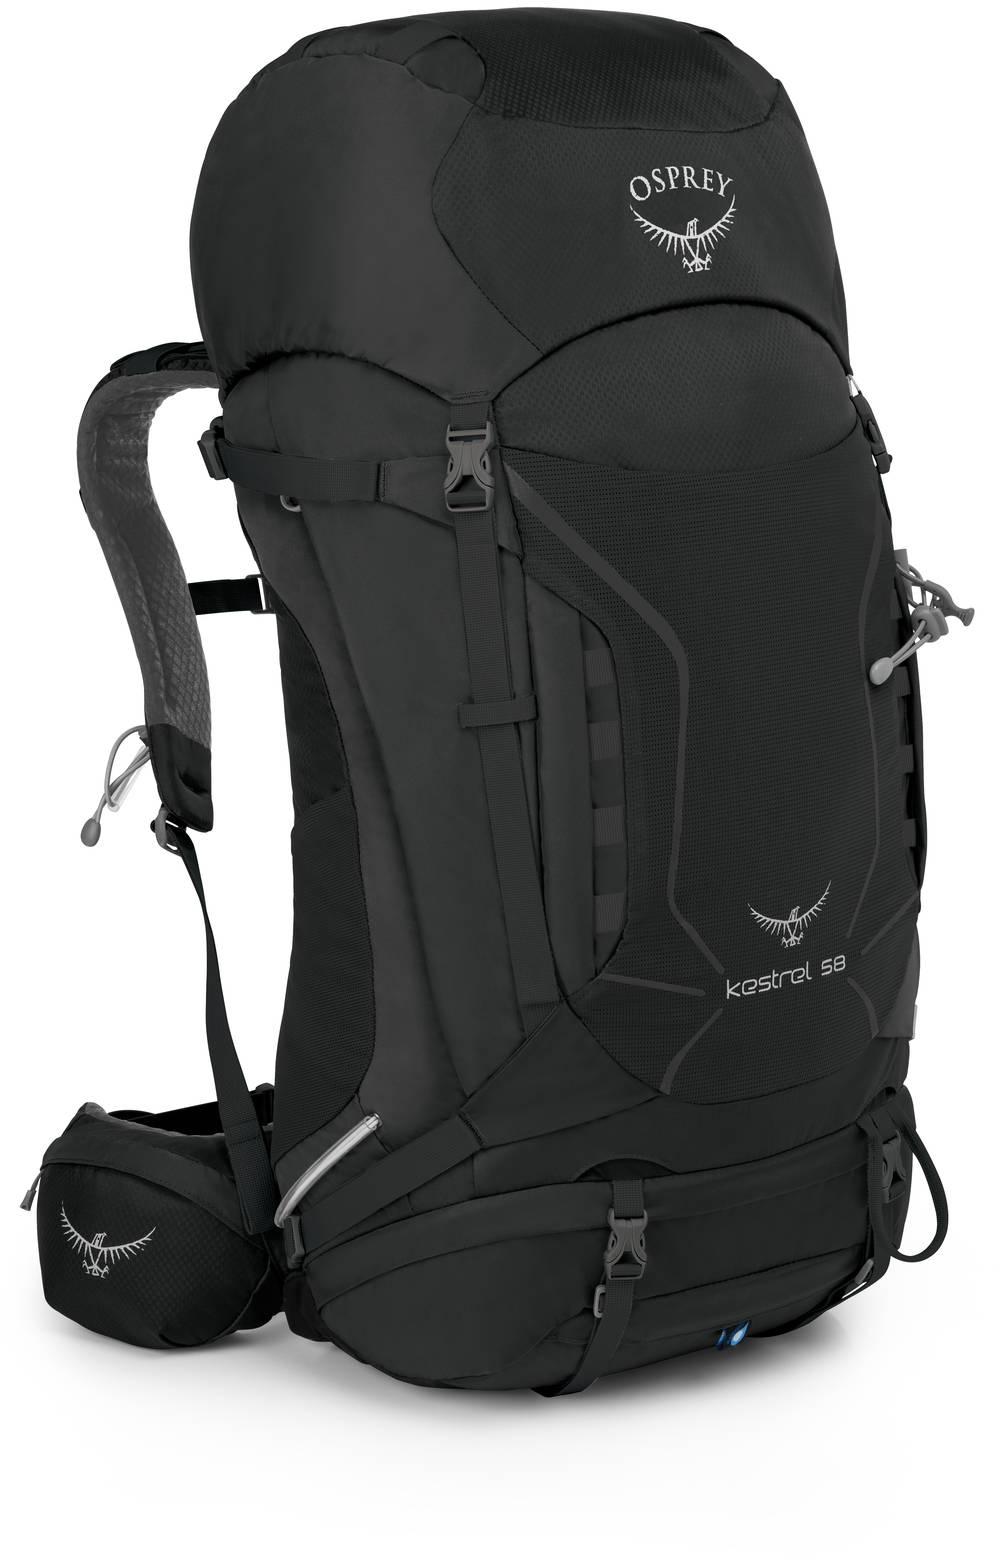 Туристические рюкзаки Рюкзак туристический Osprey Kestrel 58 Kestrel_58_Side_Ash_Grey_web.jpg